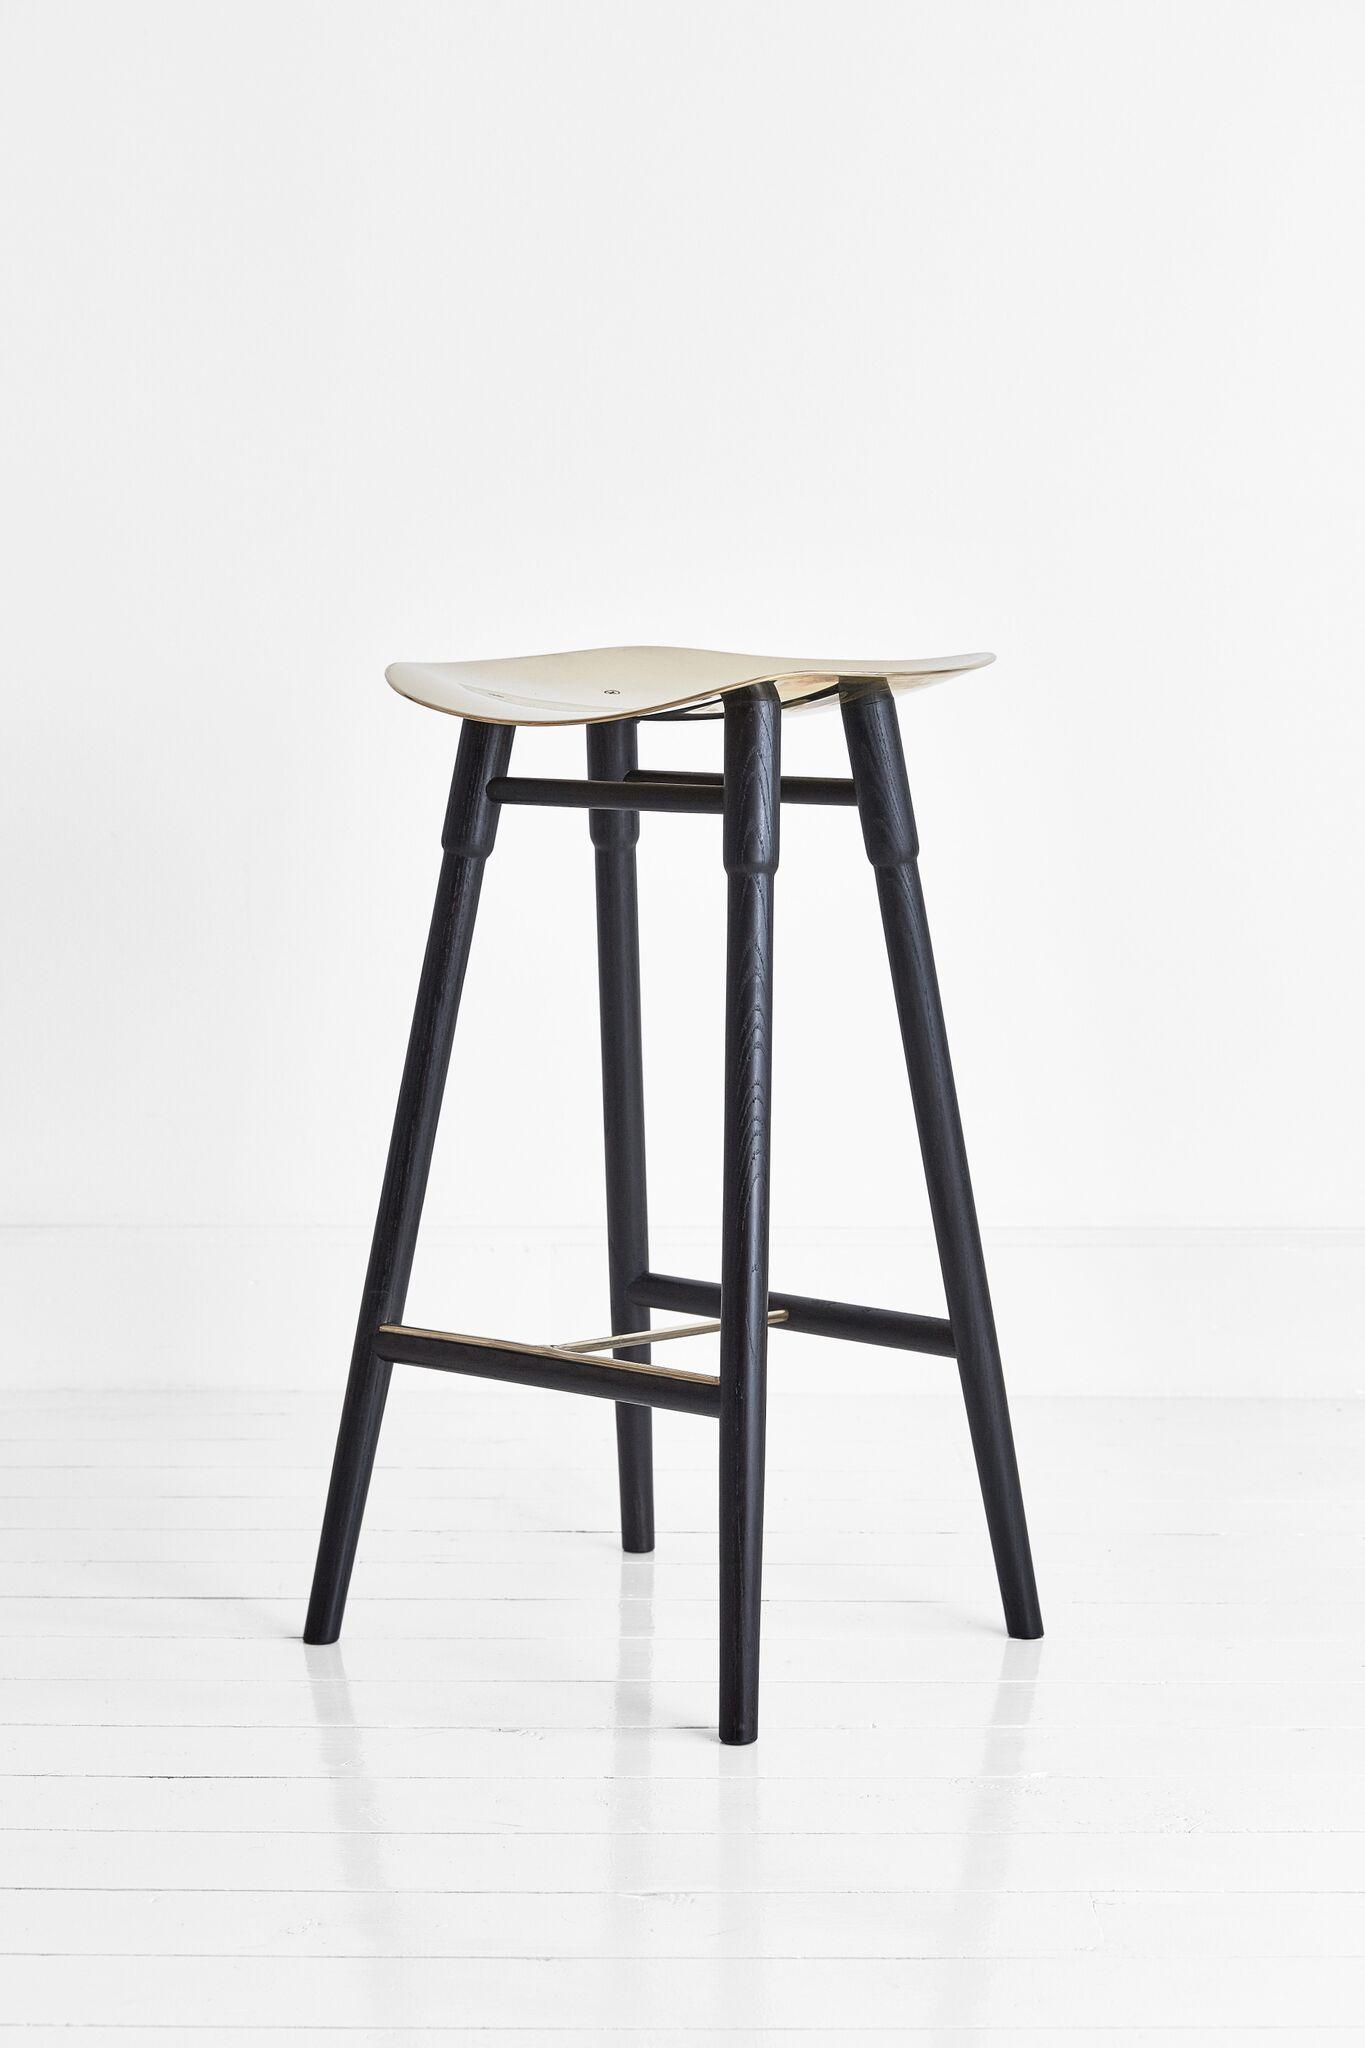 Gallery Of Dowel Stool By Mr.fräg Local Australian Furniture And Industrial Design Sydney, Nsw Image 3